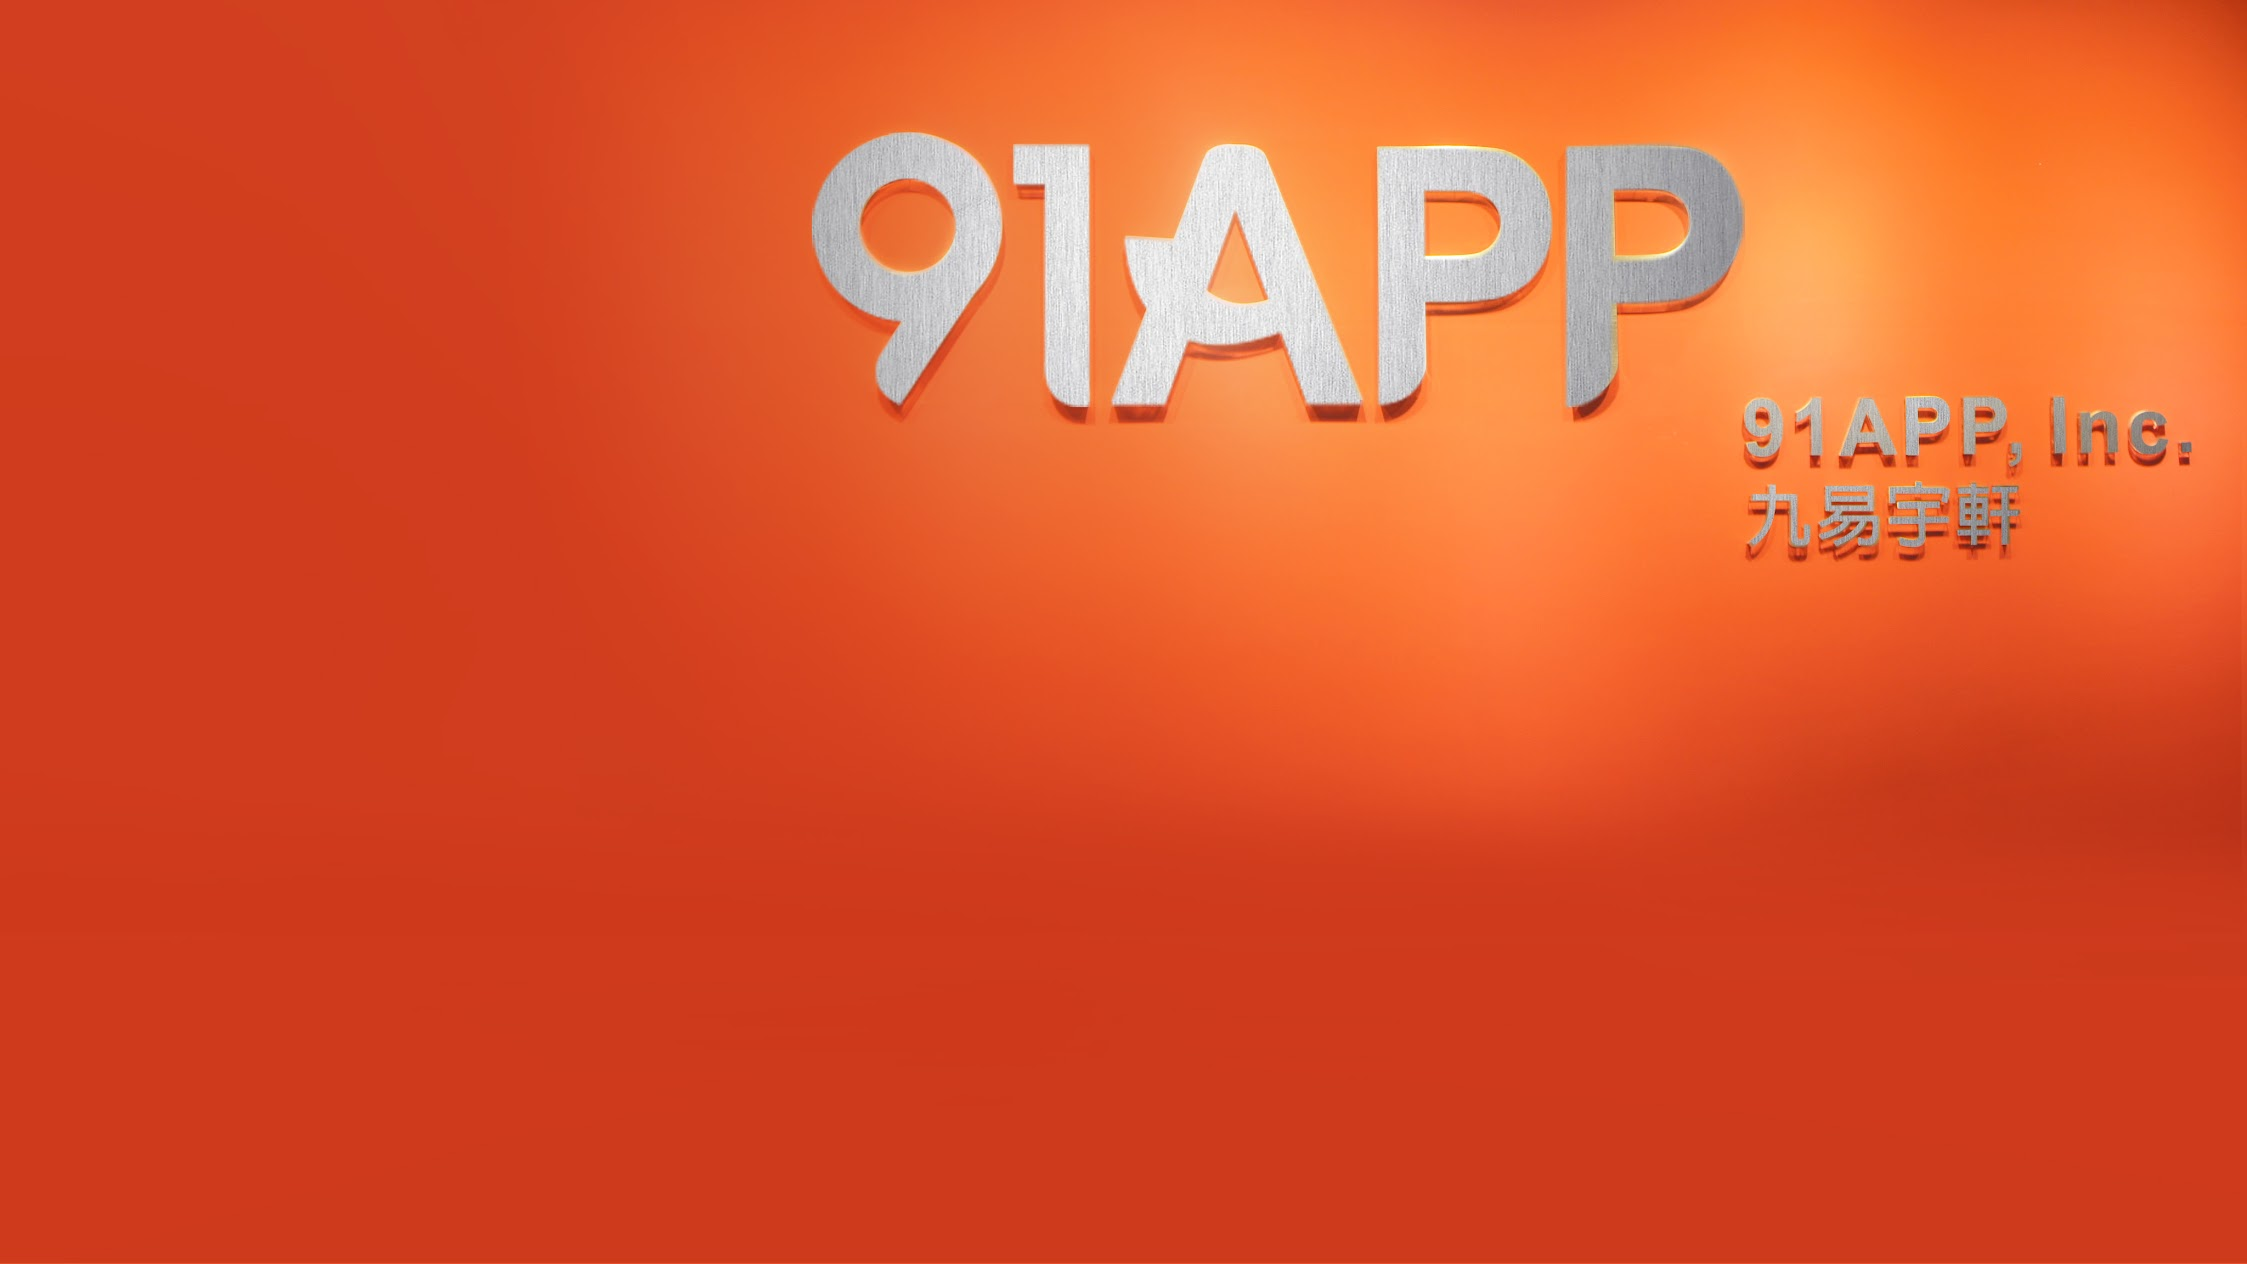 91APP, Inc. (5)